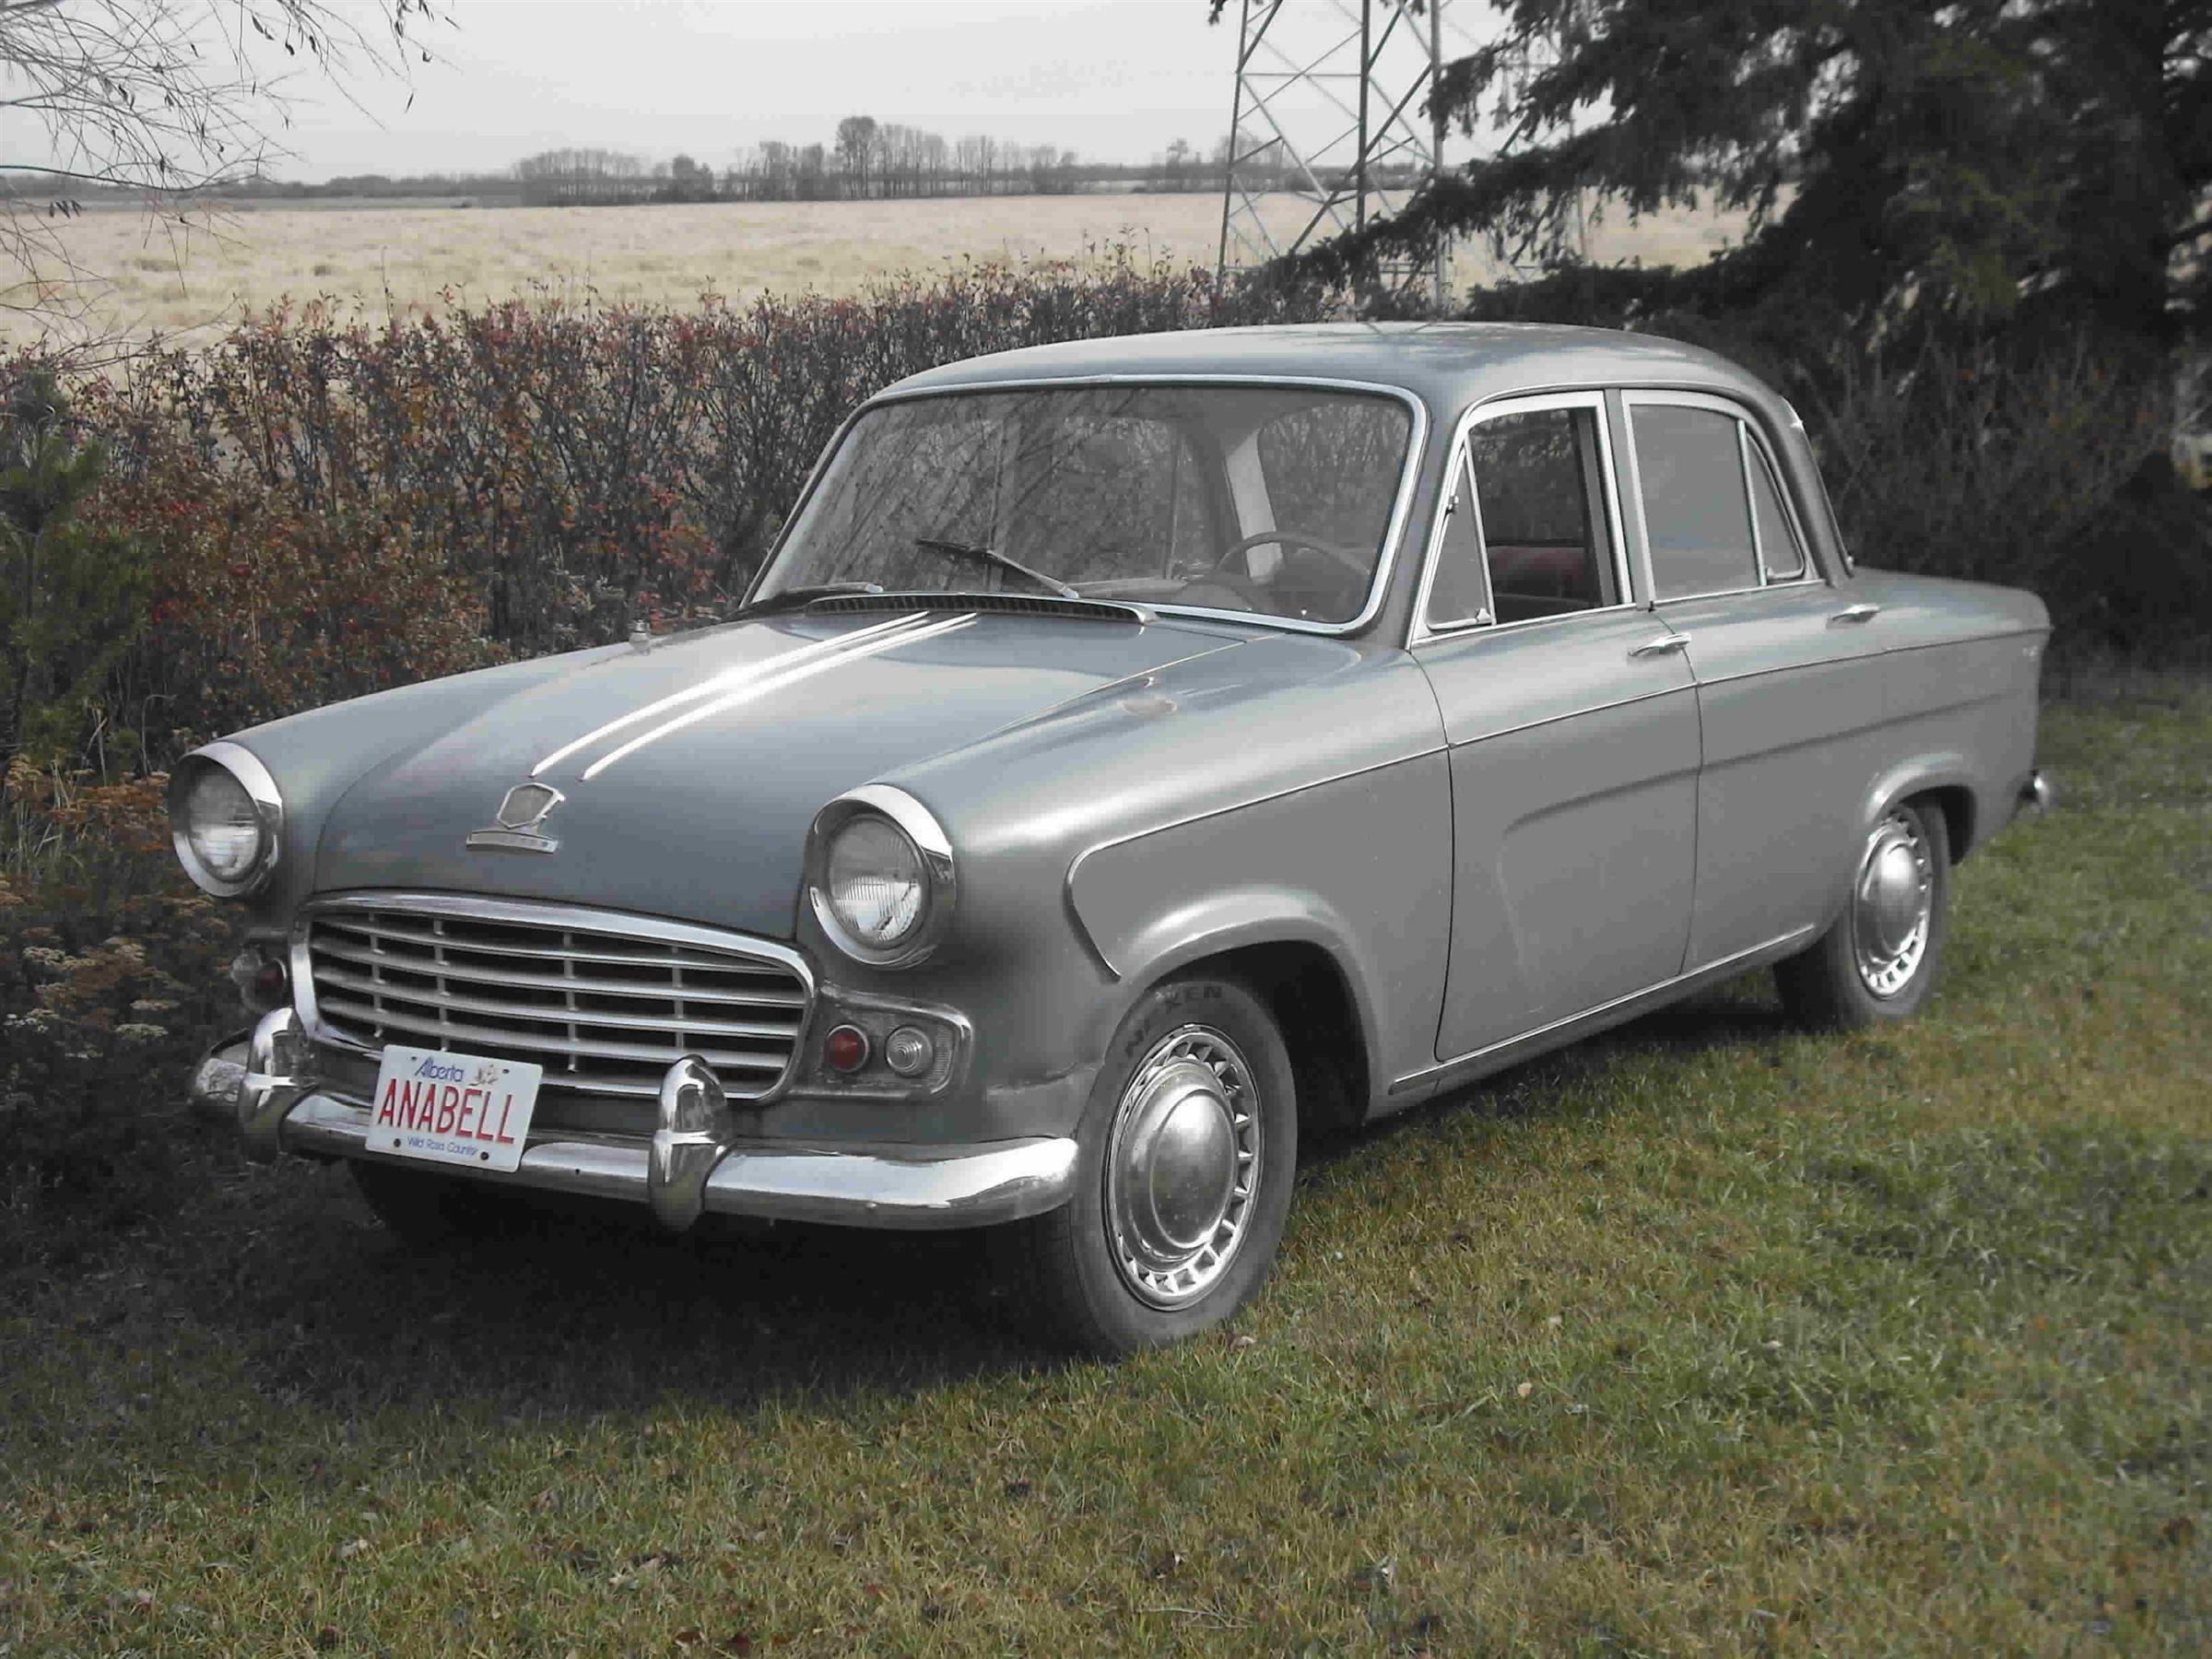 1962 Standard Vanguard Vignale | VINTAGE VEHICLES | Pinterest | Cars ...